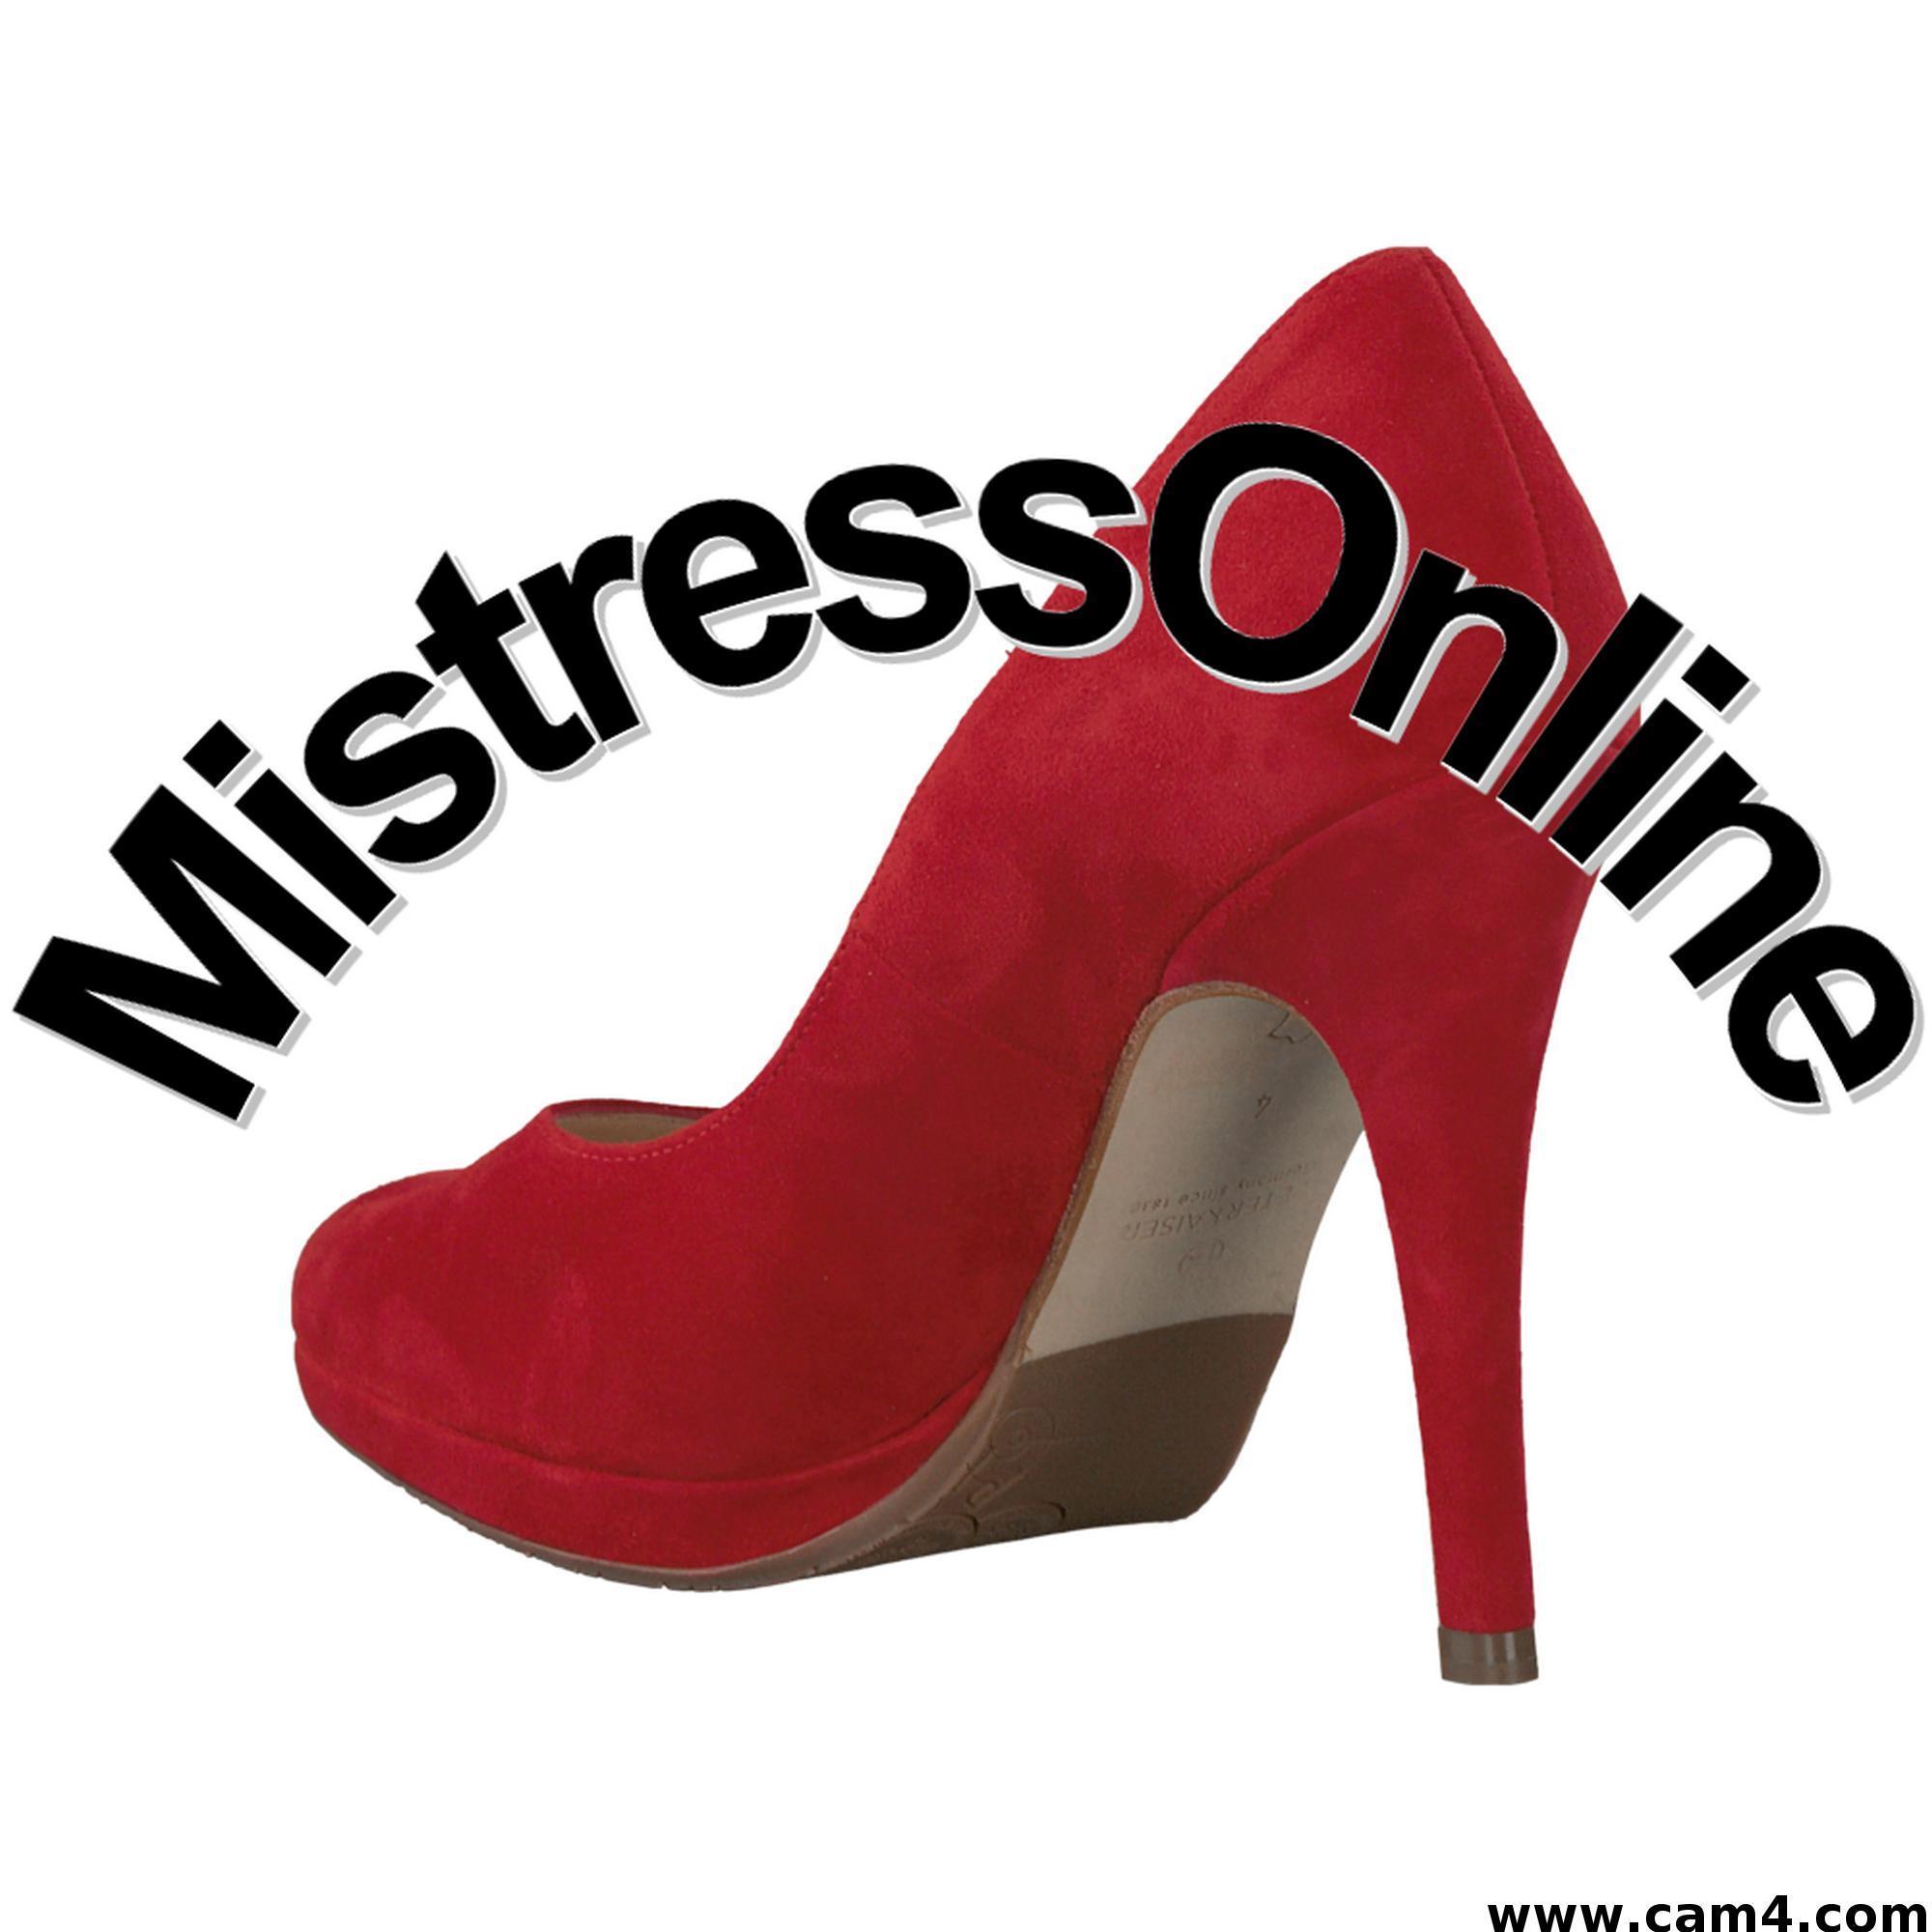 Mistressonline?s=ovhkxy4gd9oot0emr394obtl+xwp44fk9fogyxp6wzq=